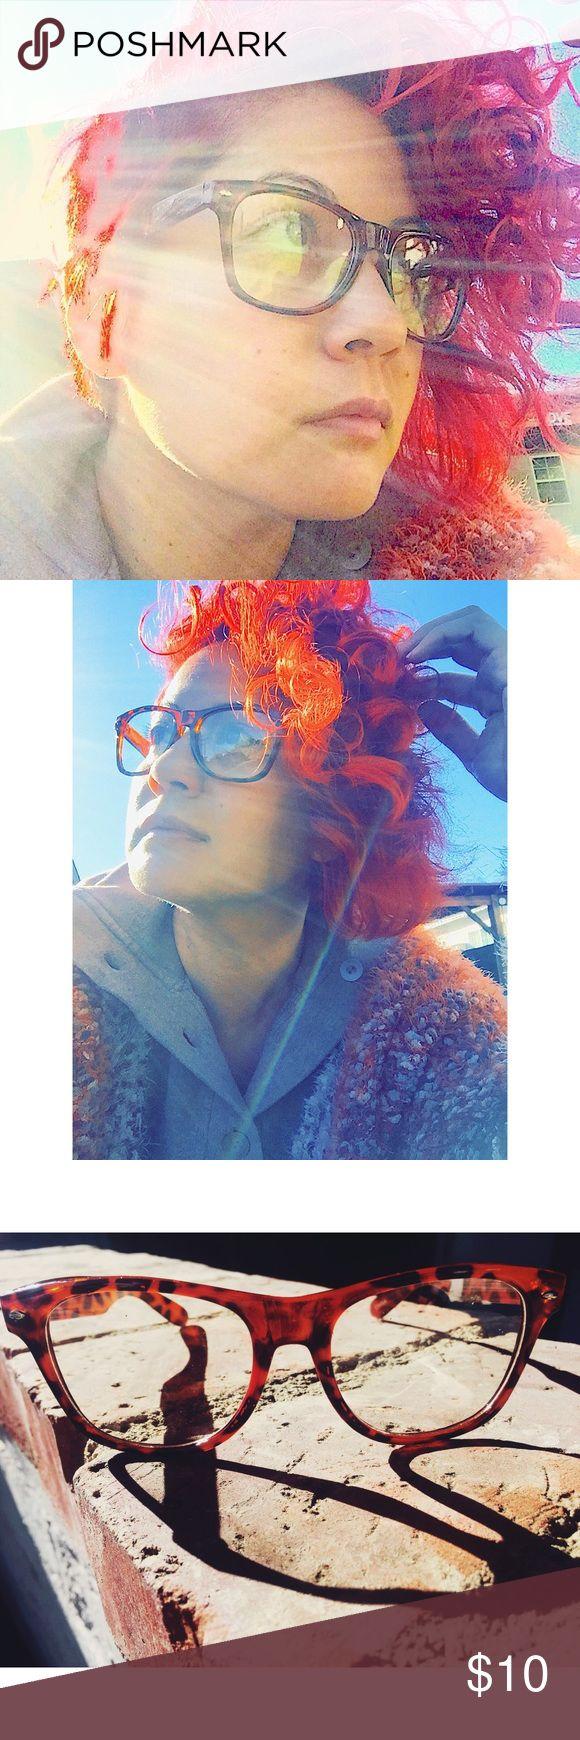 🆕 NWT 👓 Tortoise Colored Fashion Eye Glasses 🆕 NWT 👓 Tortoise Colored Fashion Eye Glasses 👓Non Prescription 👓 Accessories Glasses